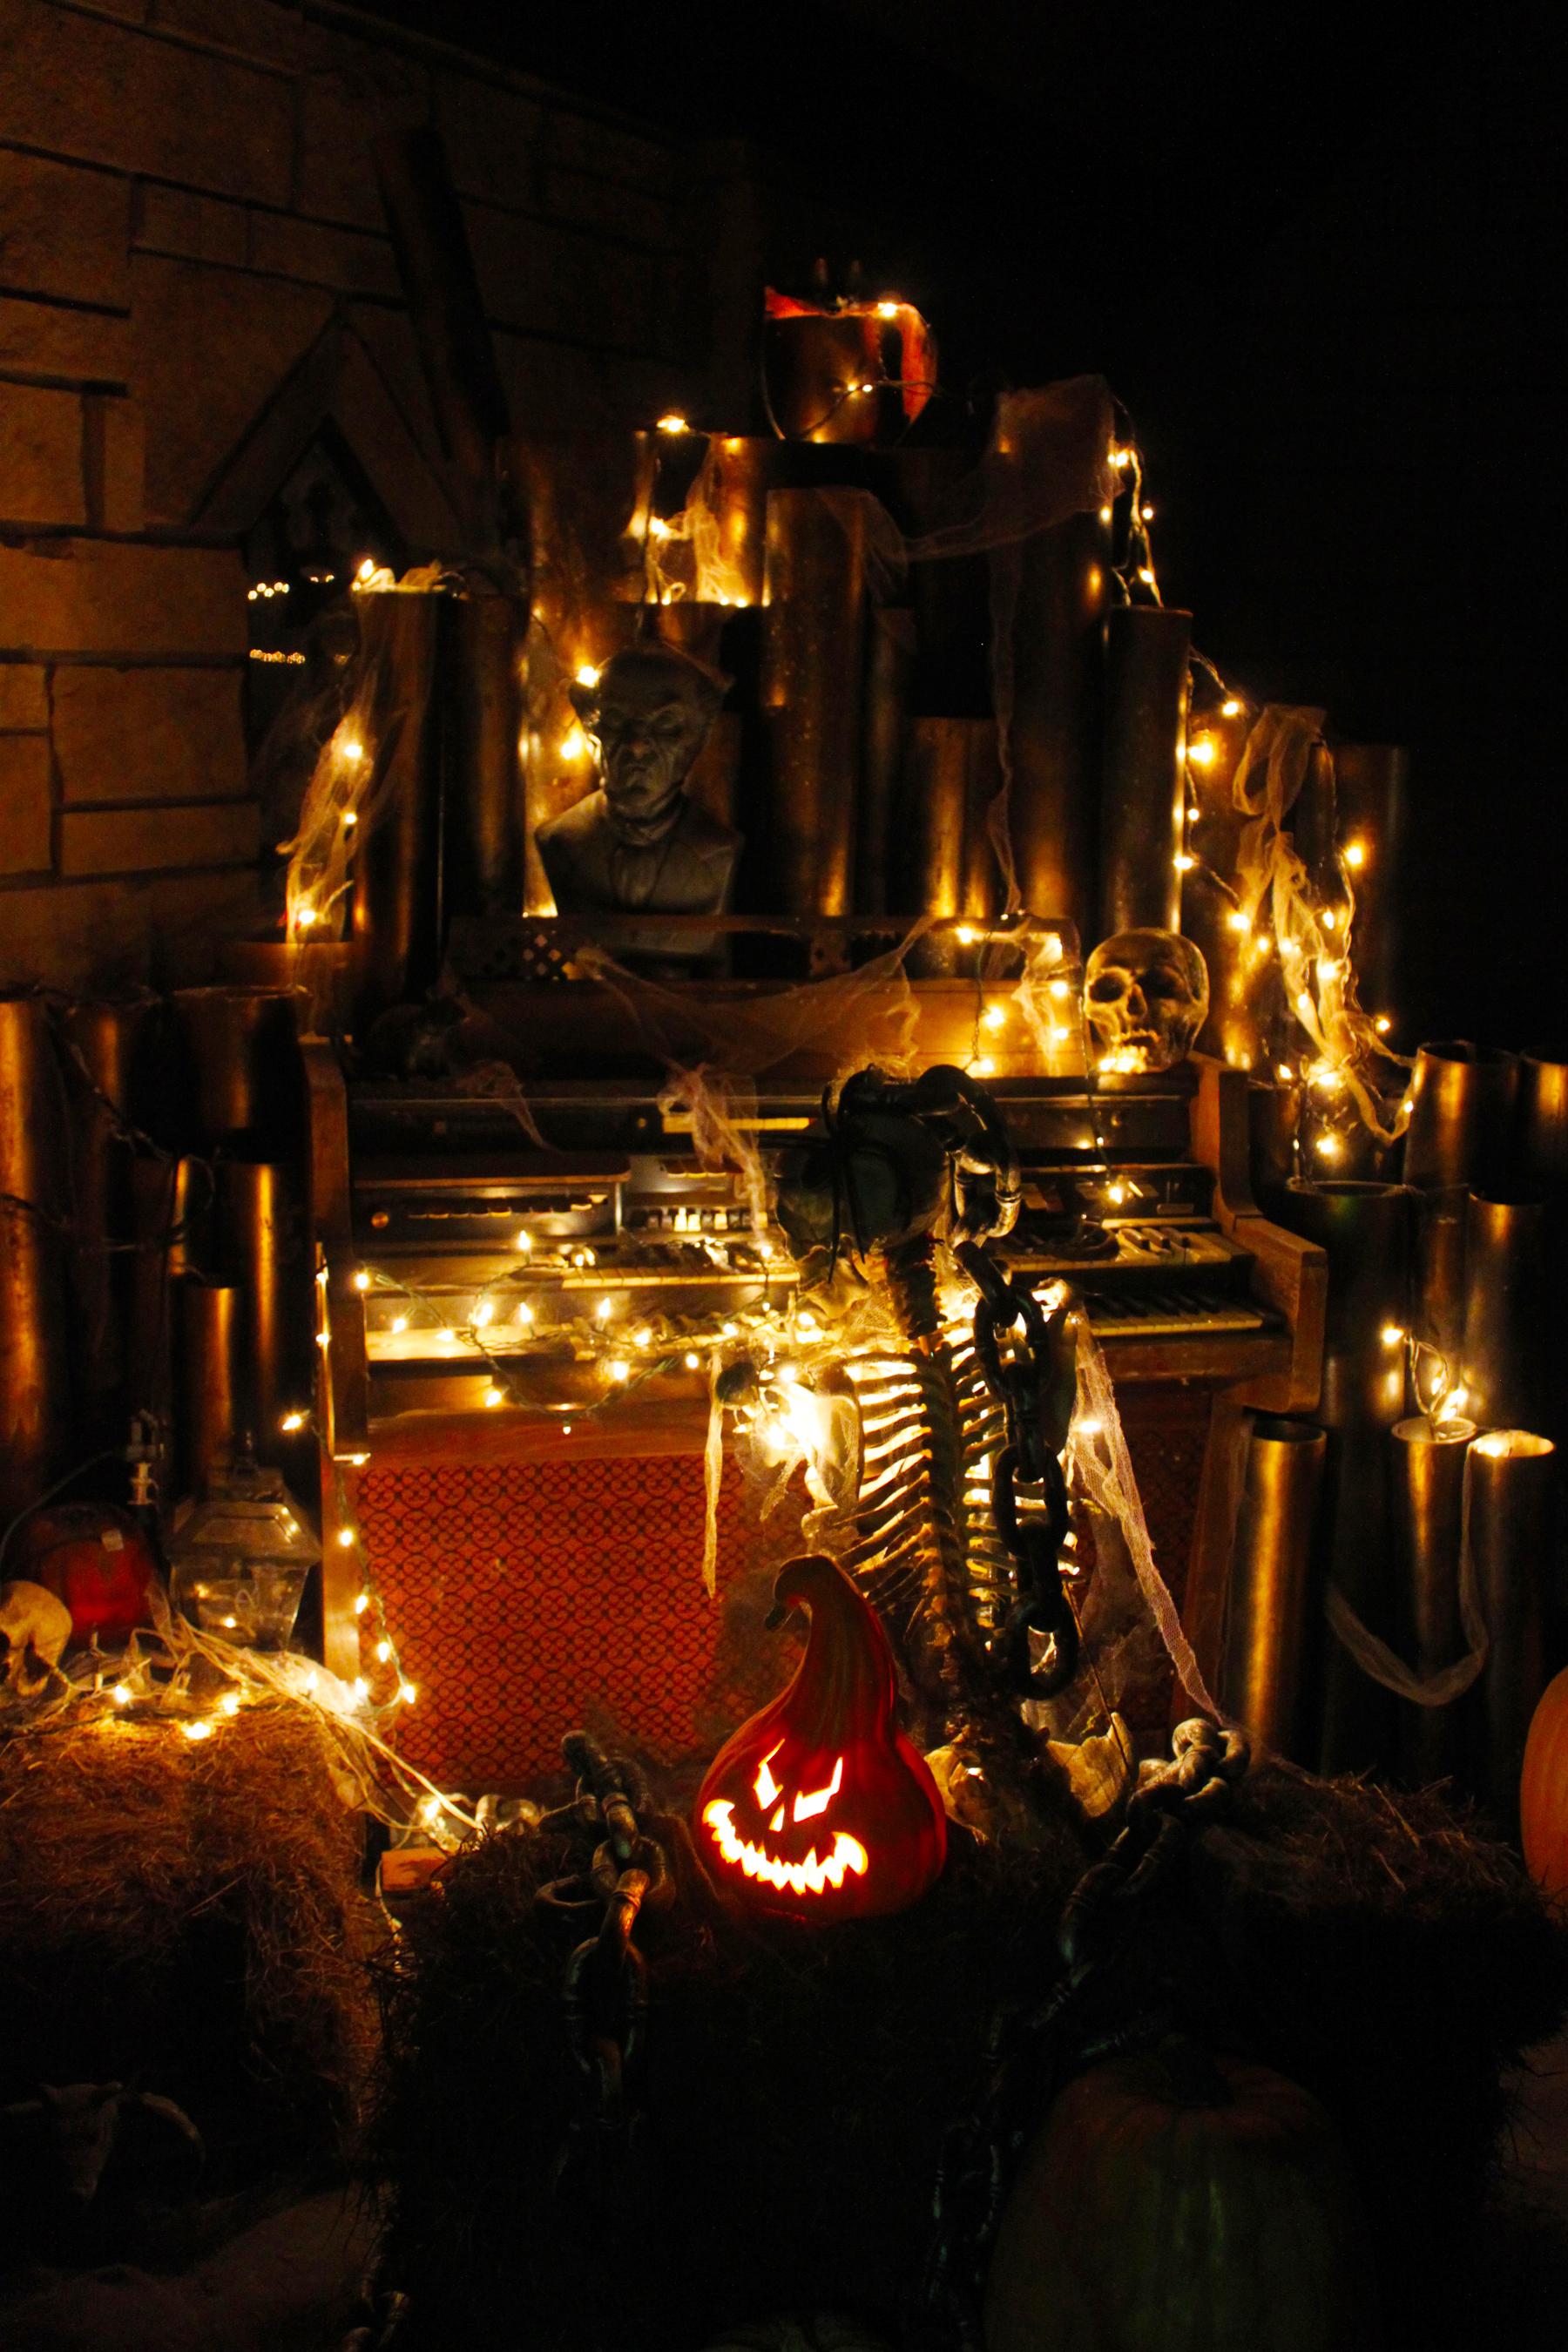 Halloween Celebration, Celebrate, Celebration, Decoration, Decorative, HQ Photo